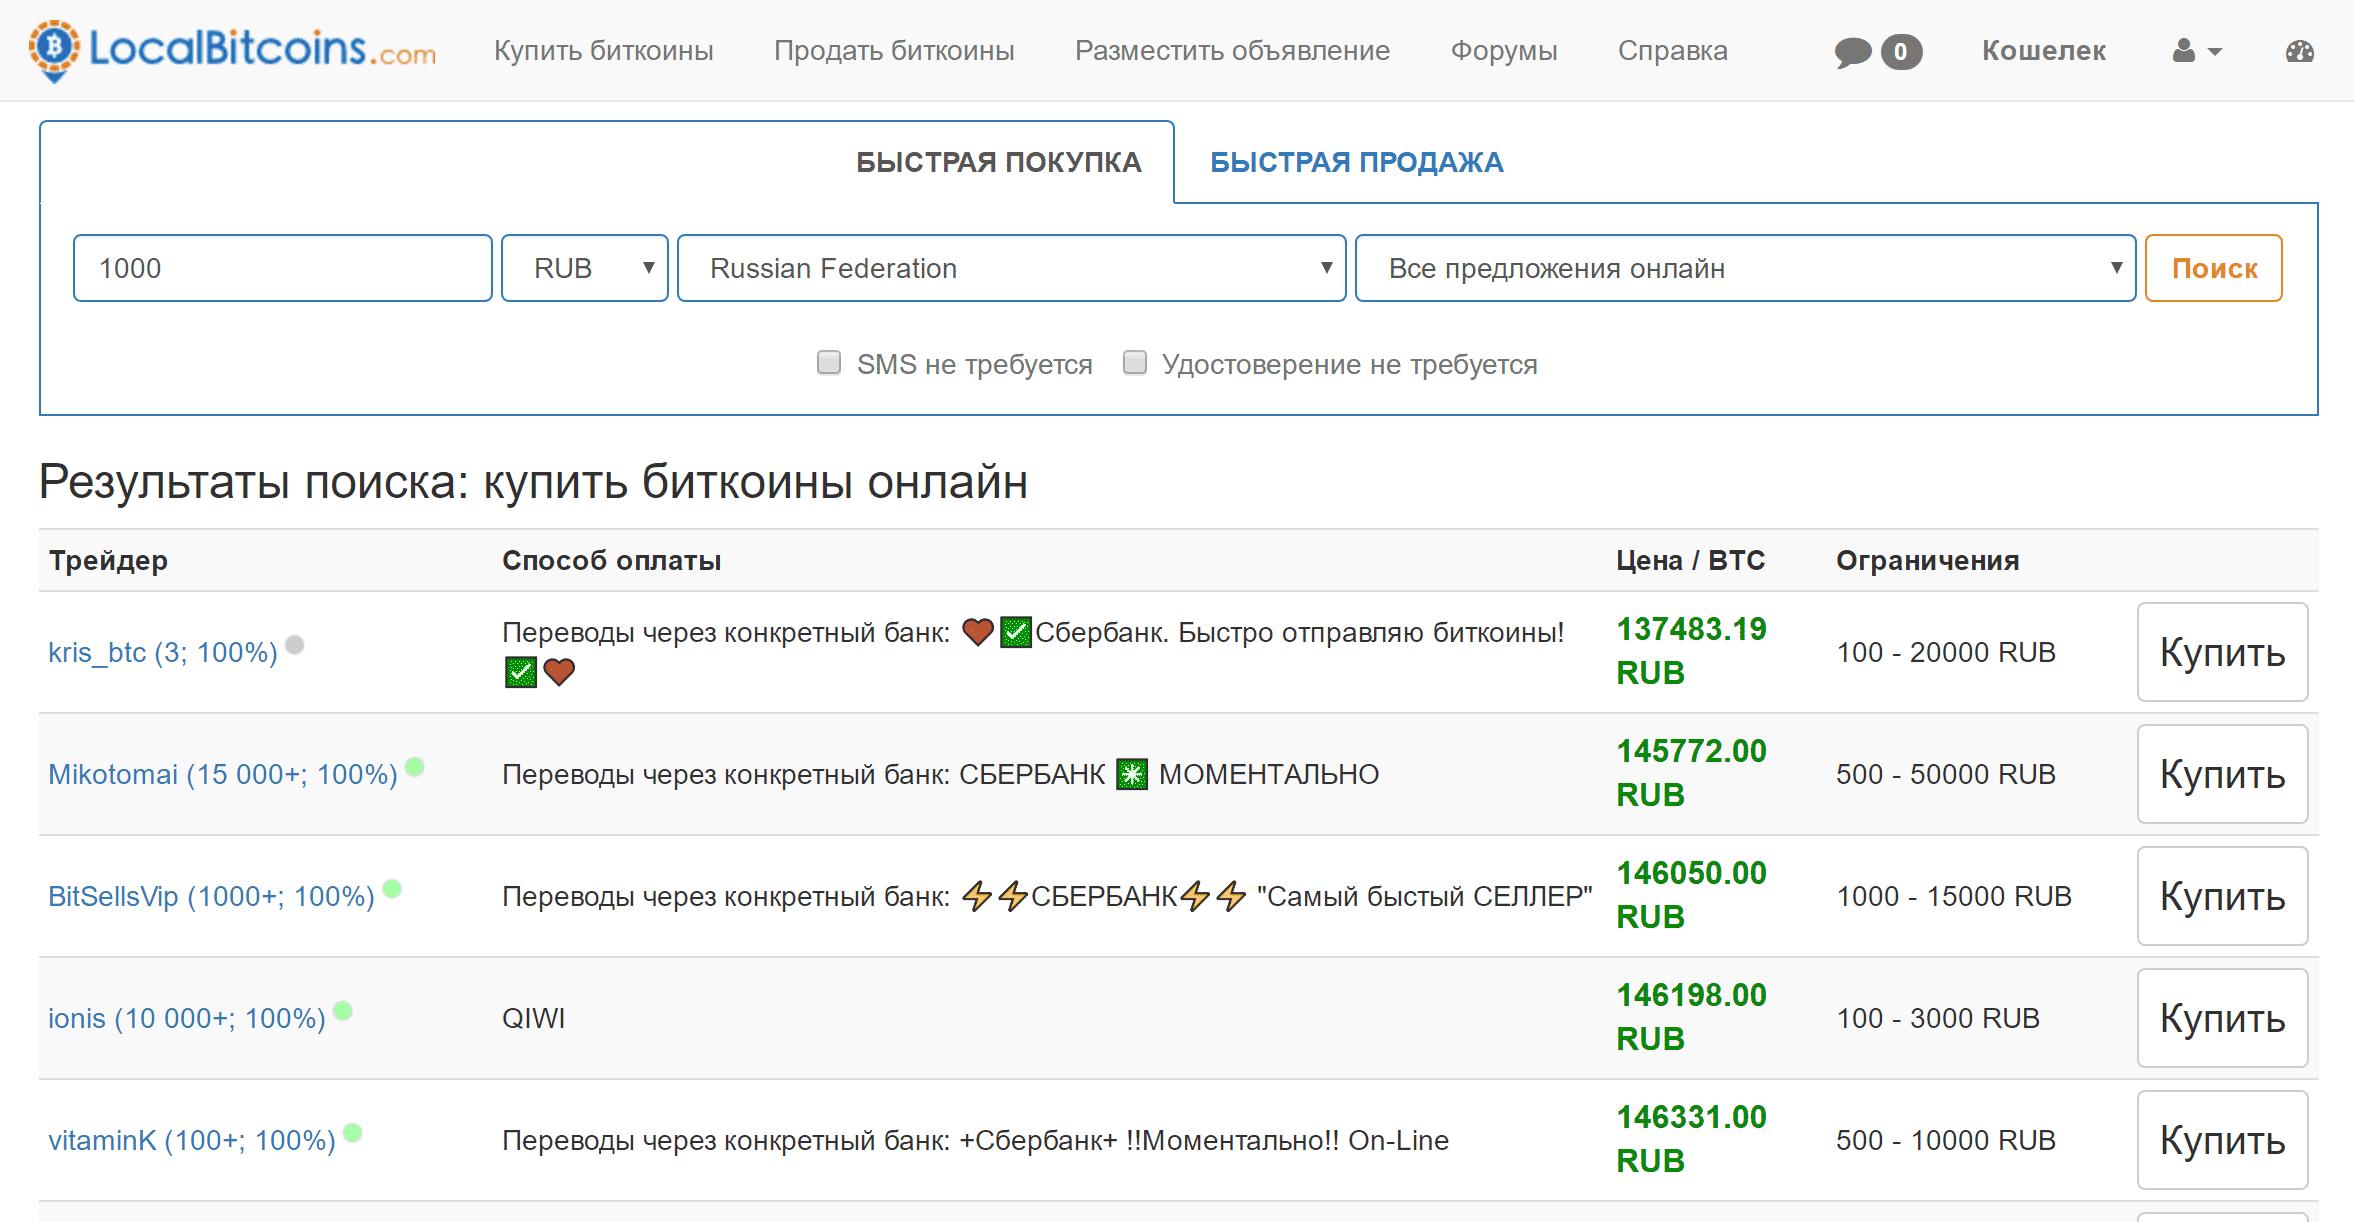 Покупка биткоинов на «Локалбиткоинс»